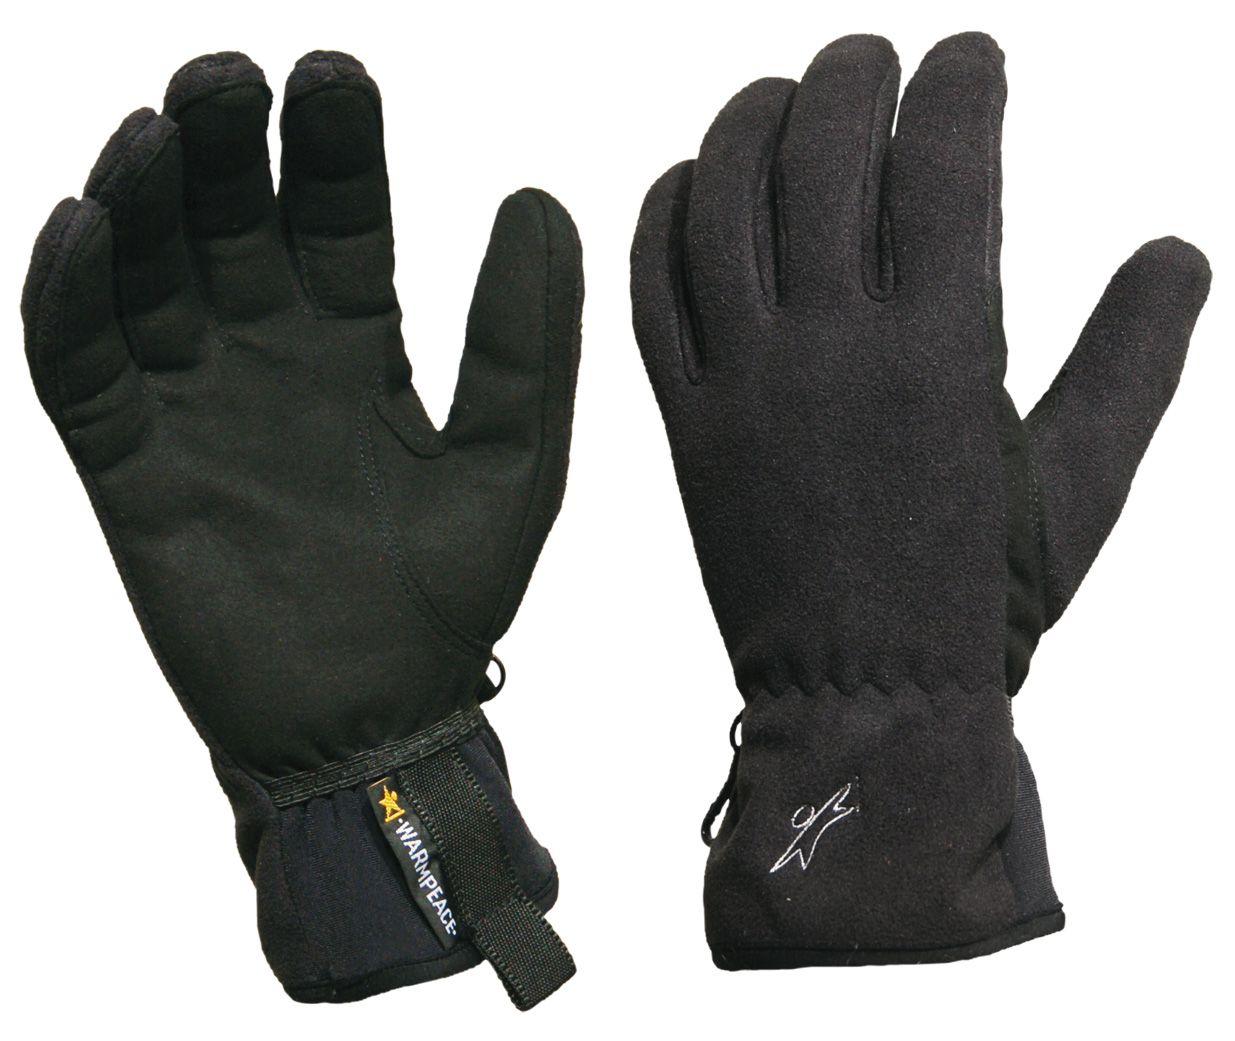 Tazz-Sport - Warmpeace Finstorm black rukavice